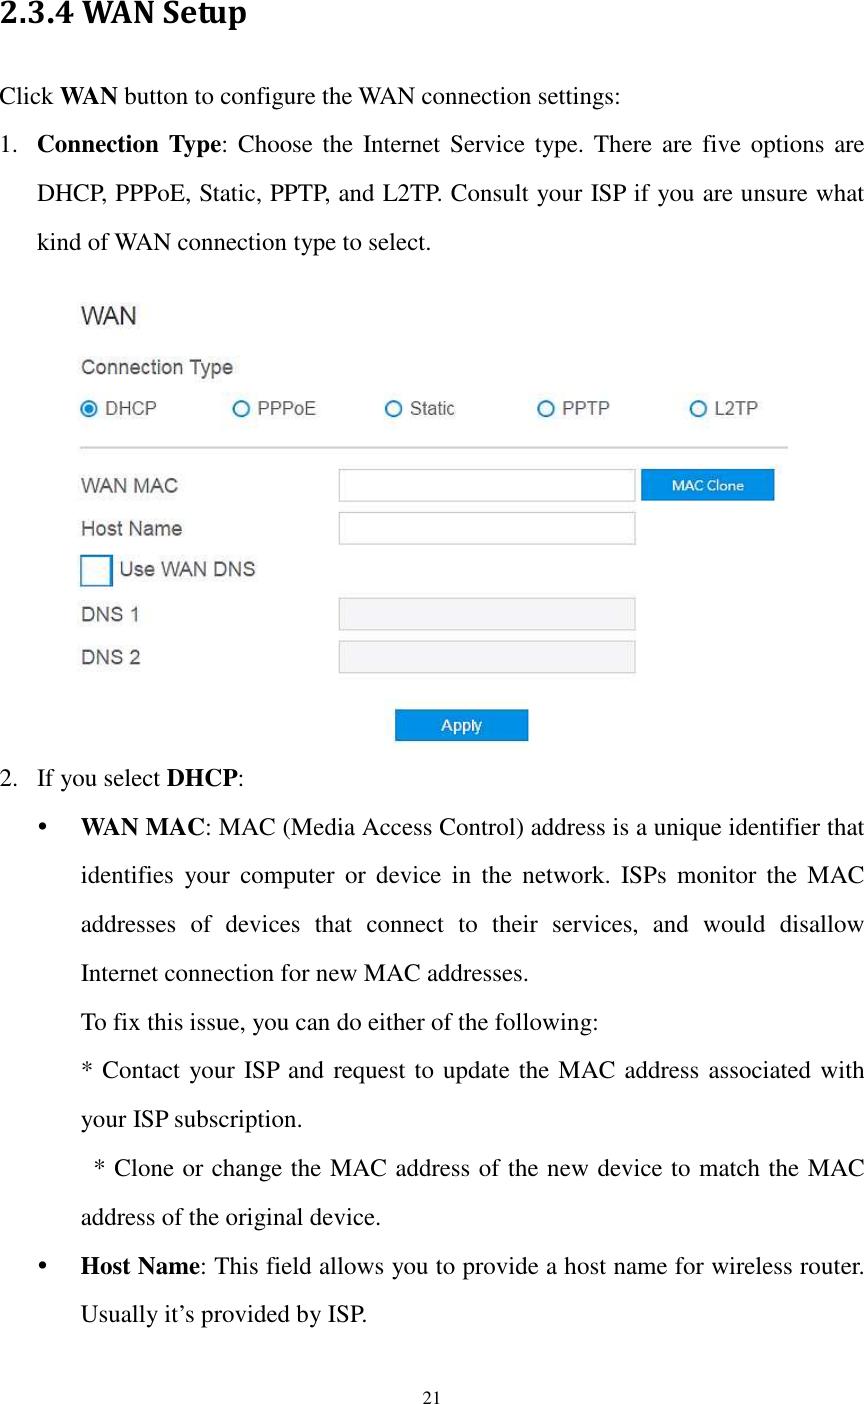 Askey Computer RAC2V1K DBDC ROUTER User Manual Spectrum WiFi